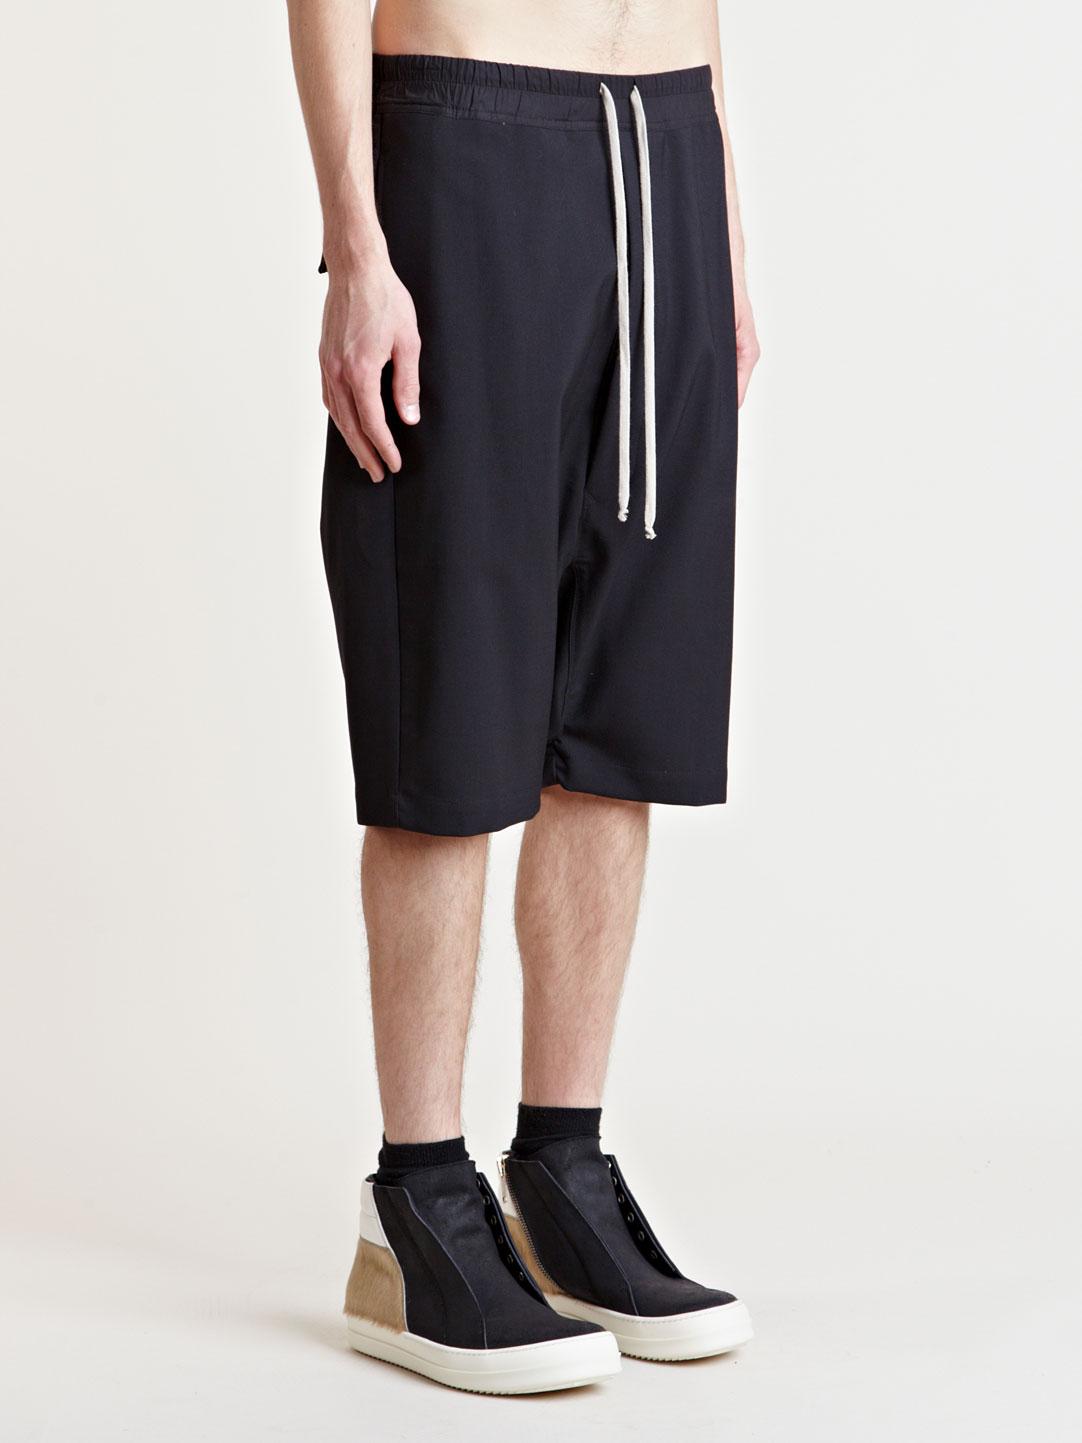 Rick Owens Men's Structured Pod Shorts | LN-CC